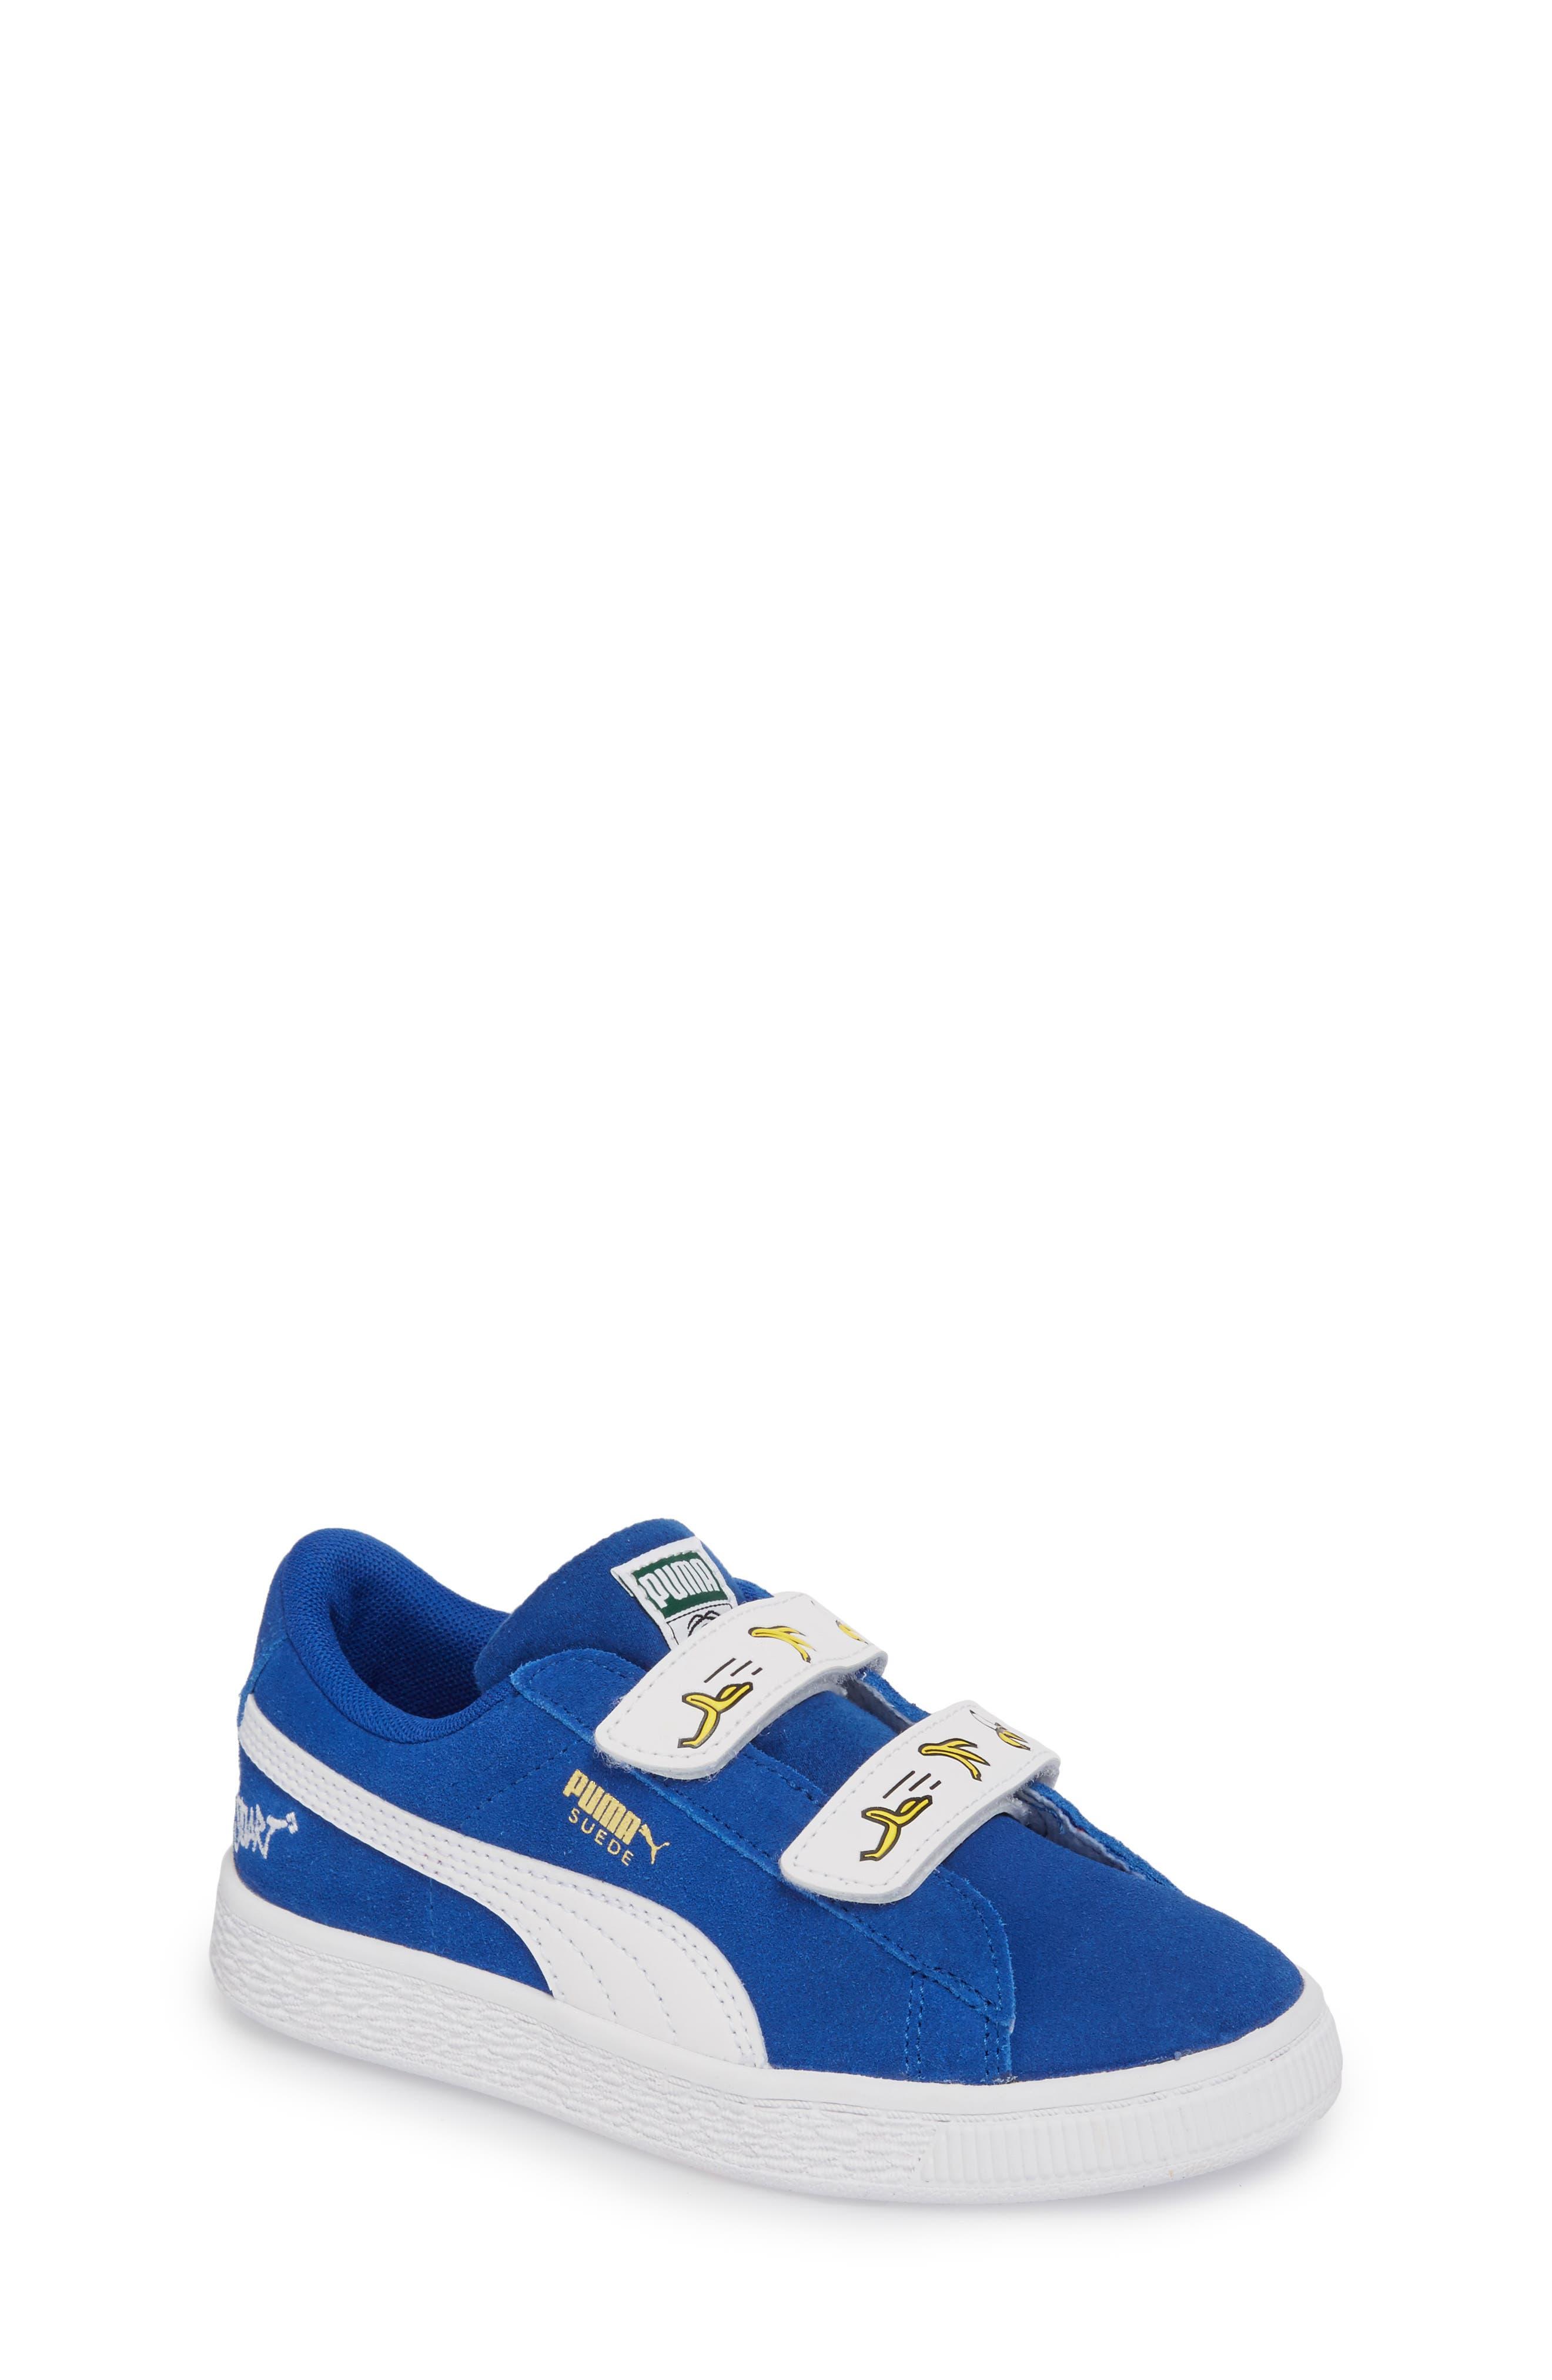 x Minions Suede V Sneaker,                             Main thumbnail 1, color,                             Olympian Blue/ Puma White